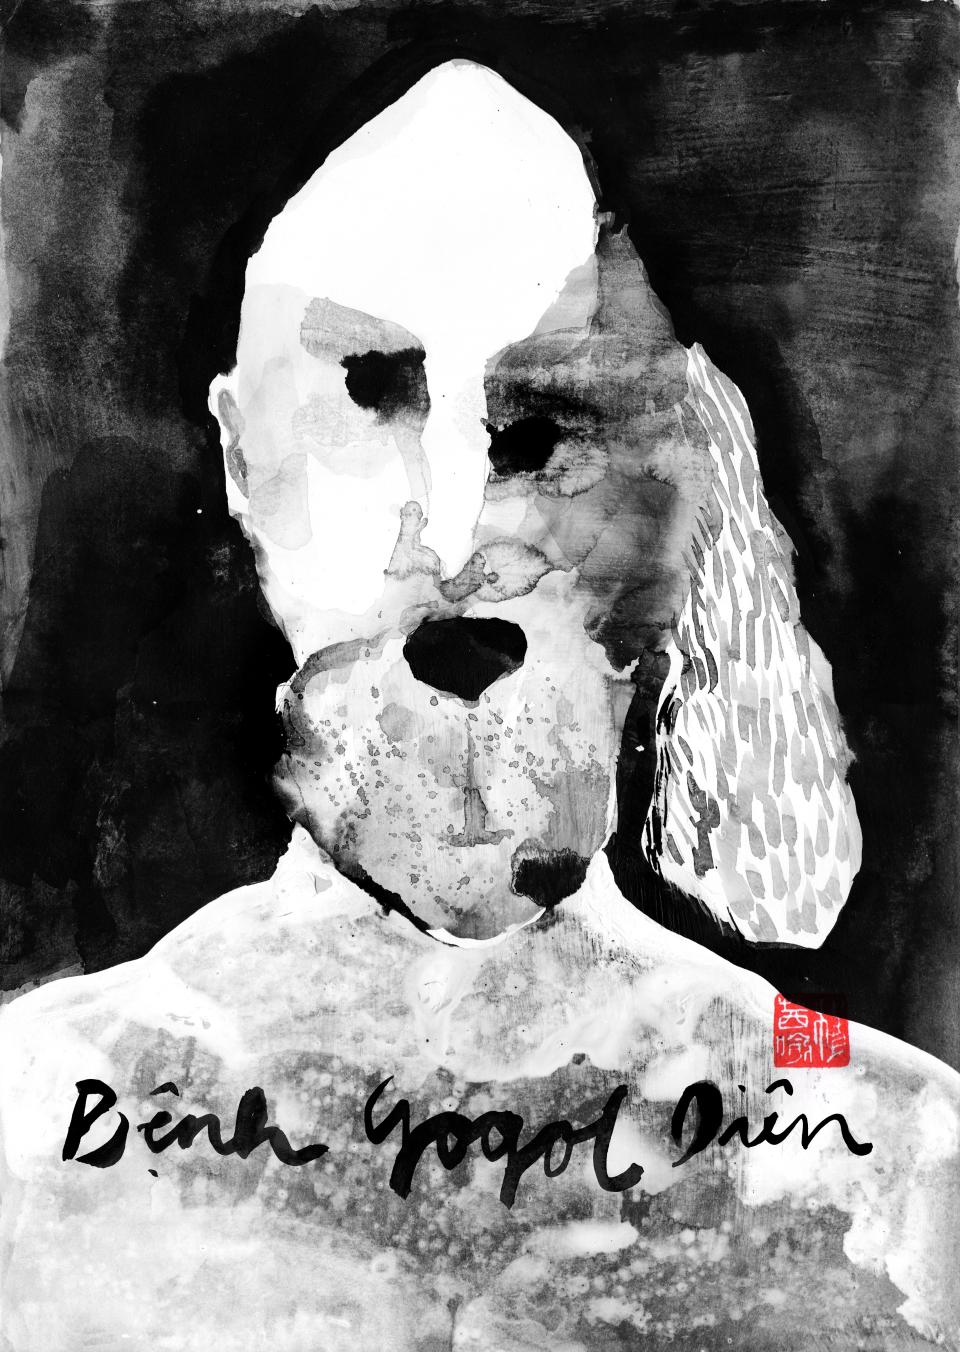 Bild: benh-gogol-dien-benh-gogol-dien